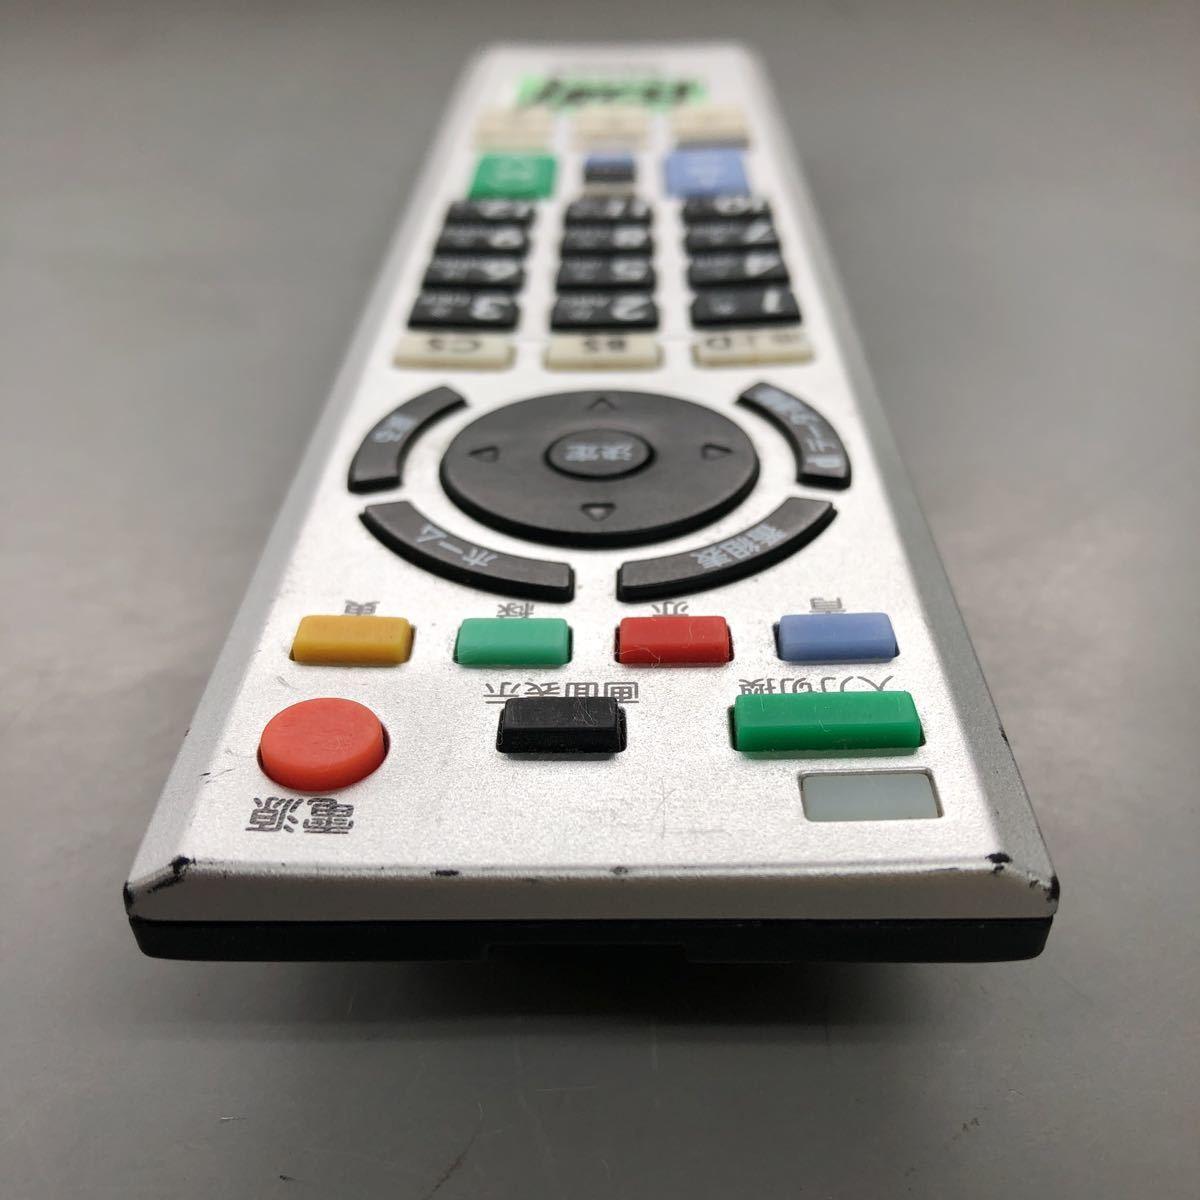 (B207)送料無料 ELPA シャープテレビ用 リモコン RC-201SH_画像5